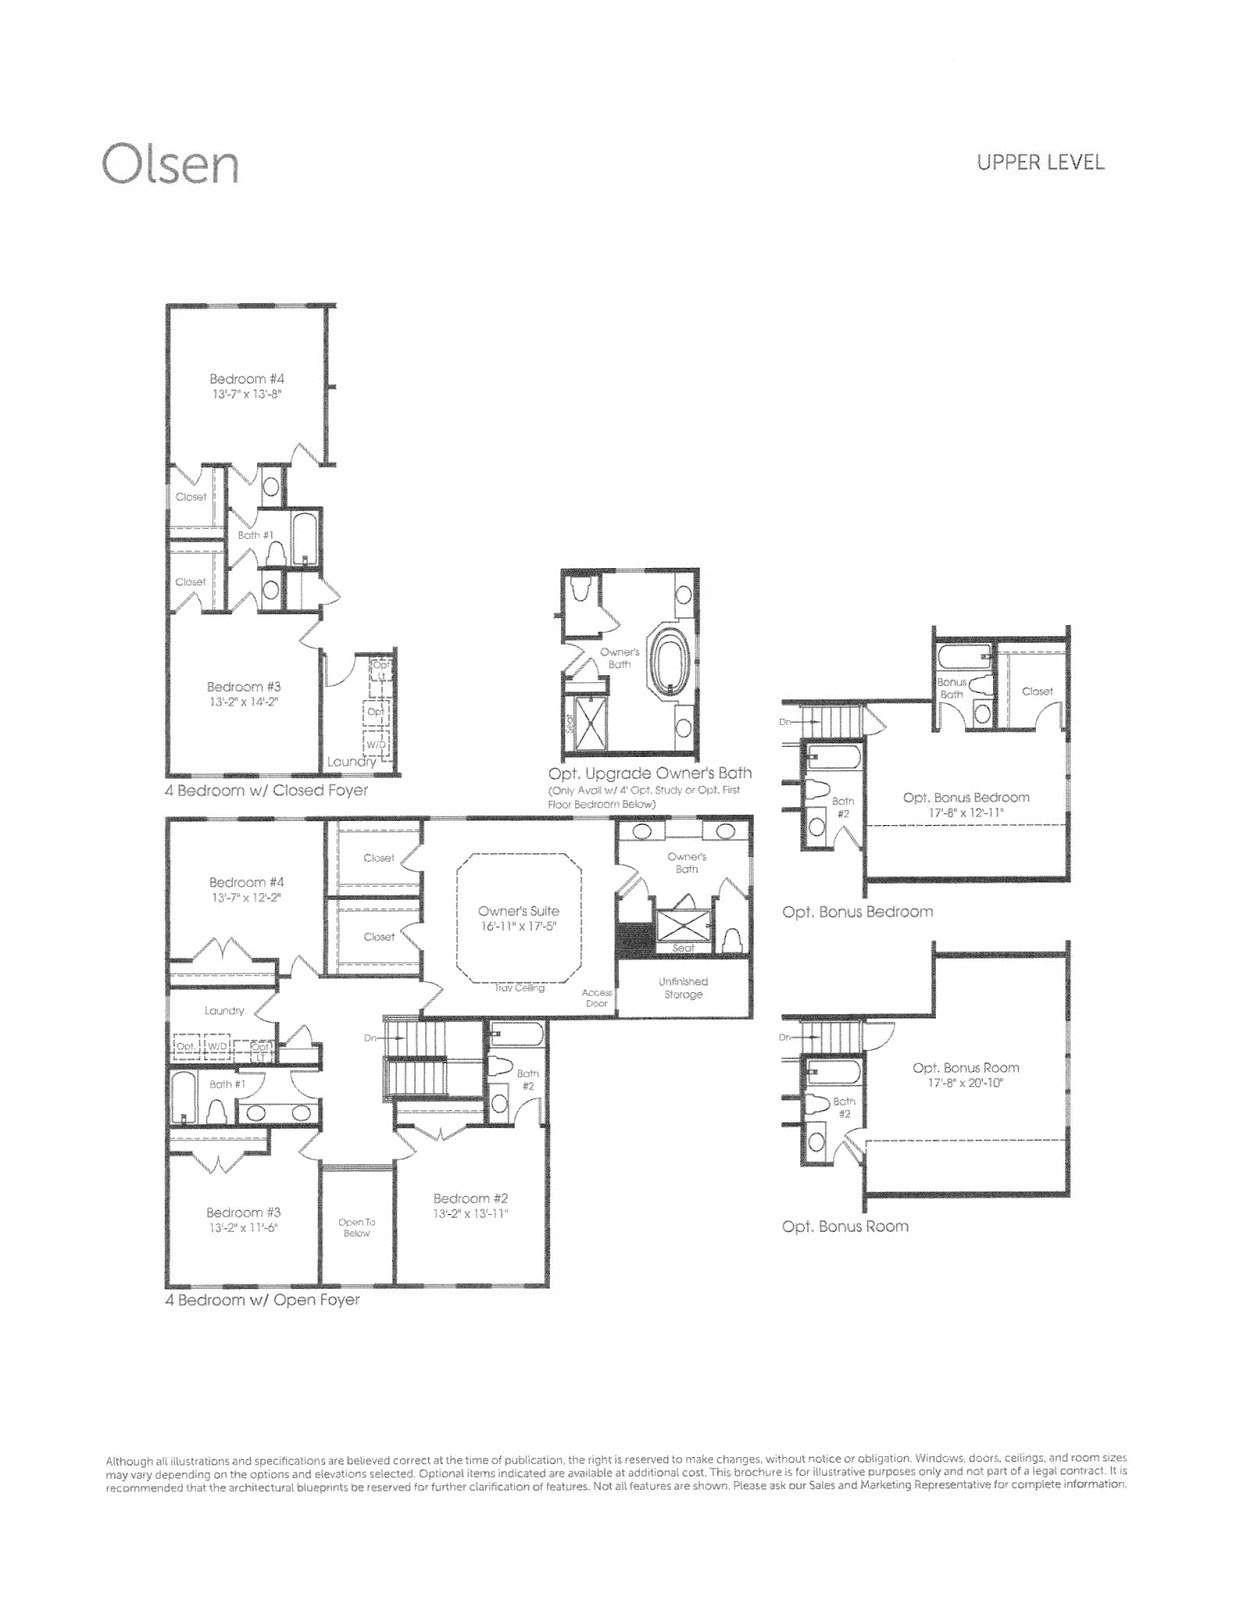 olsensecondfloor nice ryan homes ohio floor plans 8